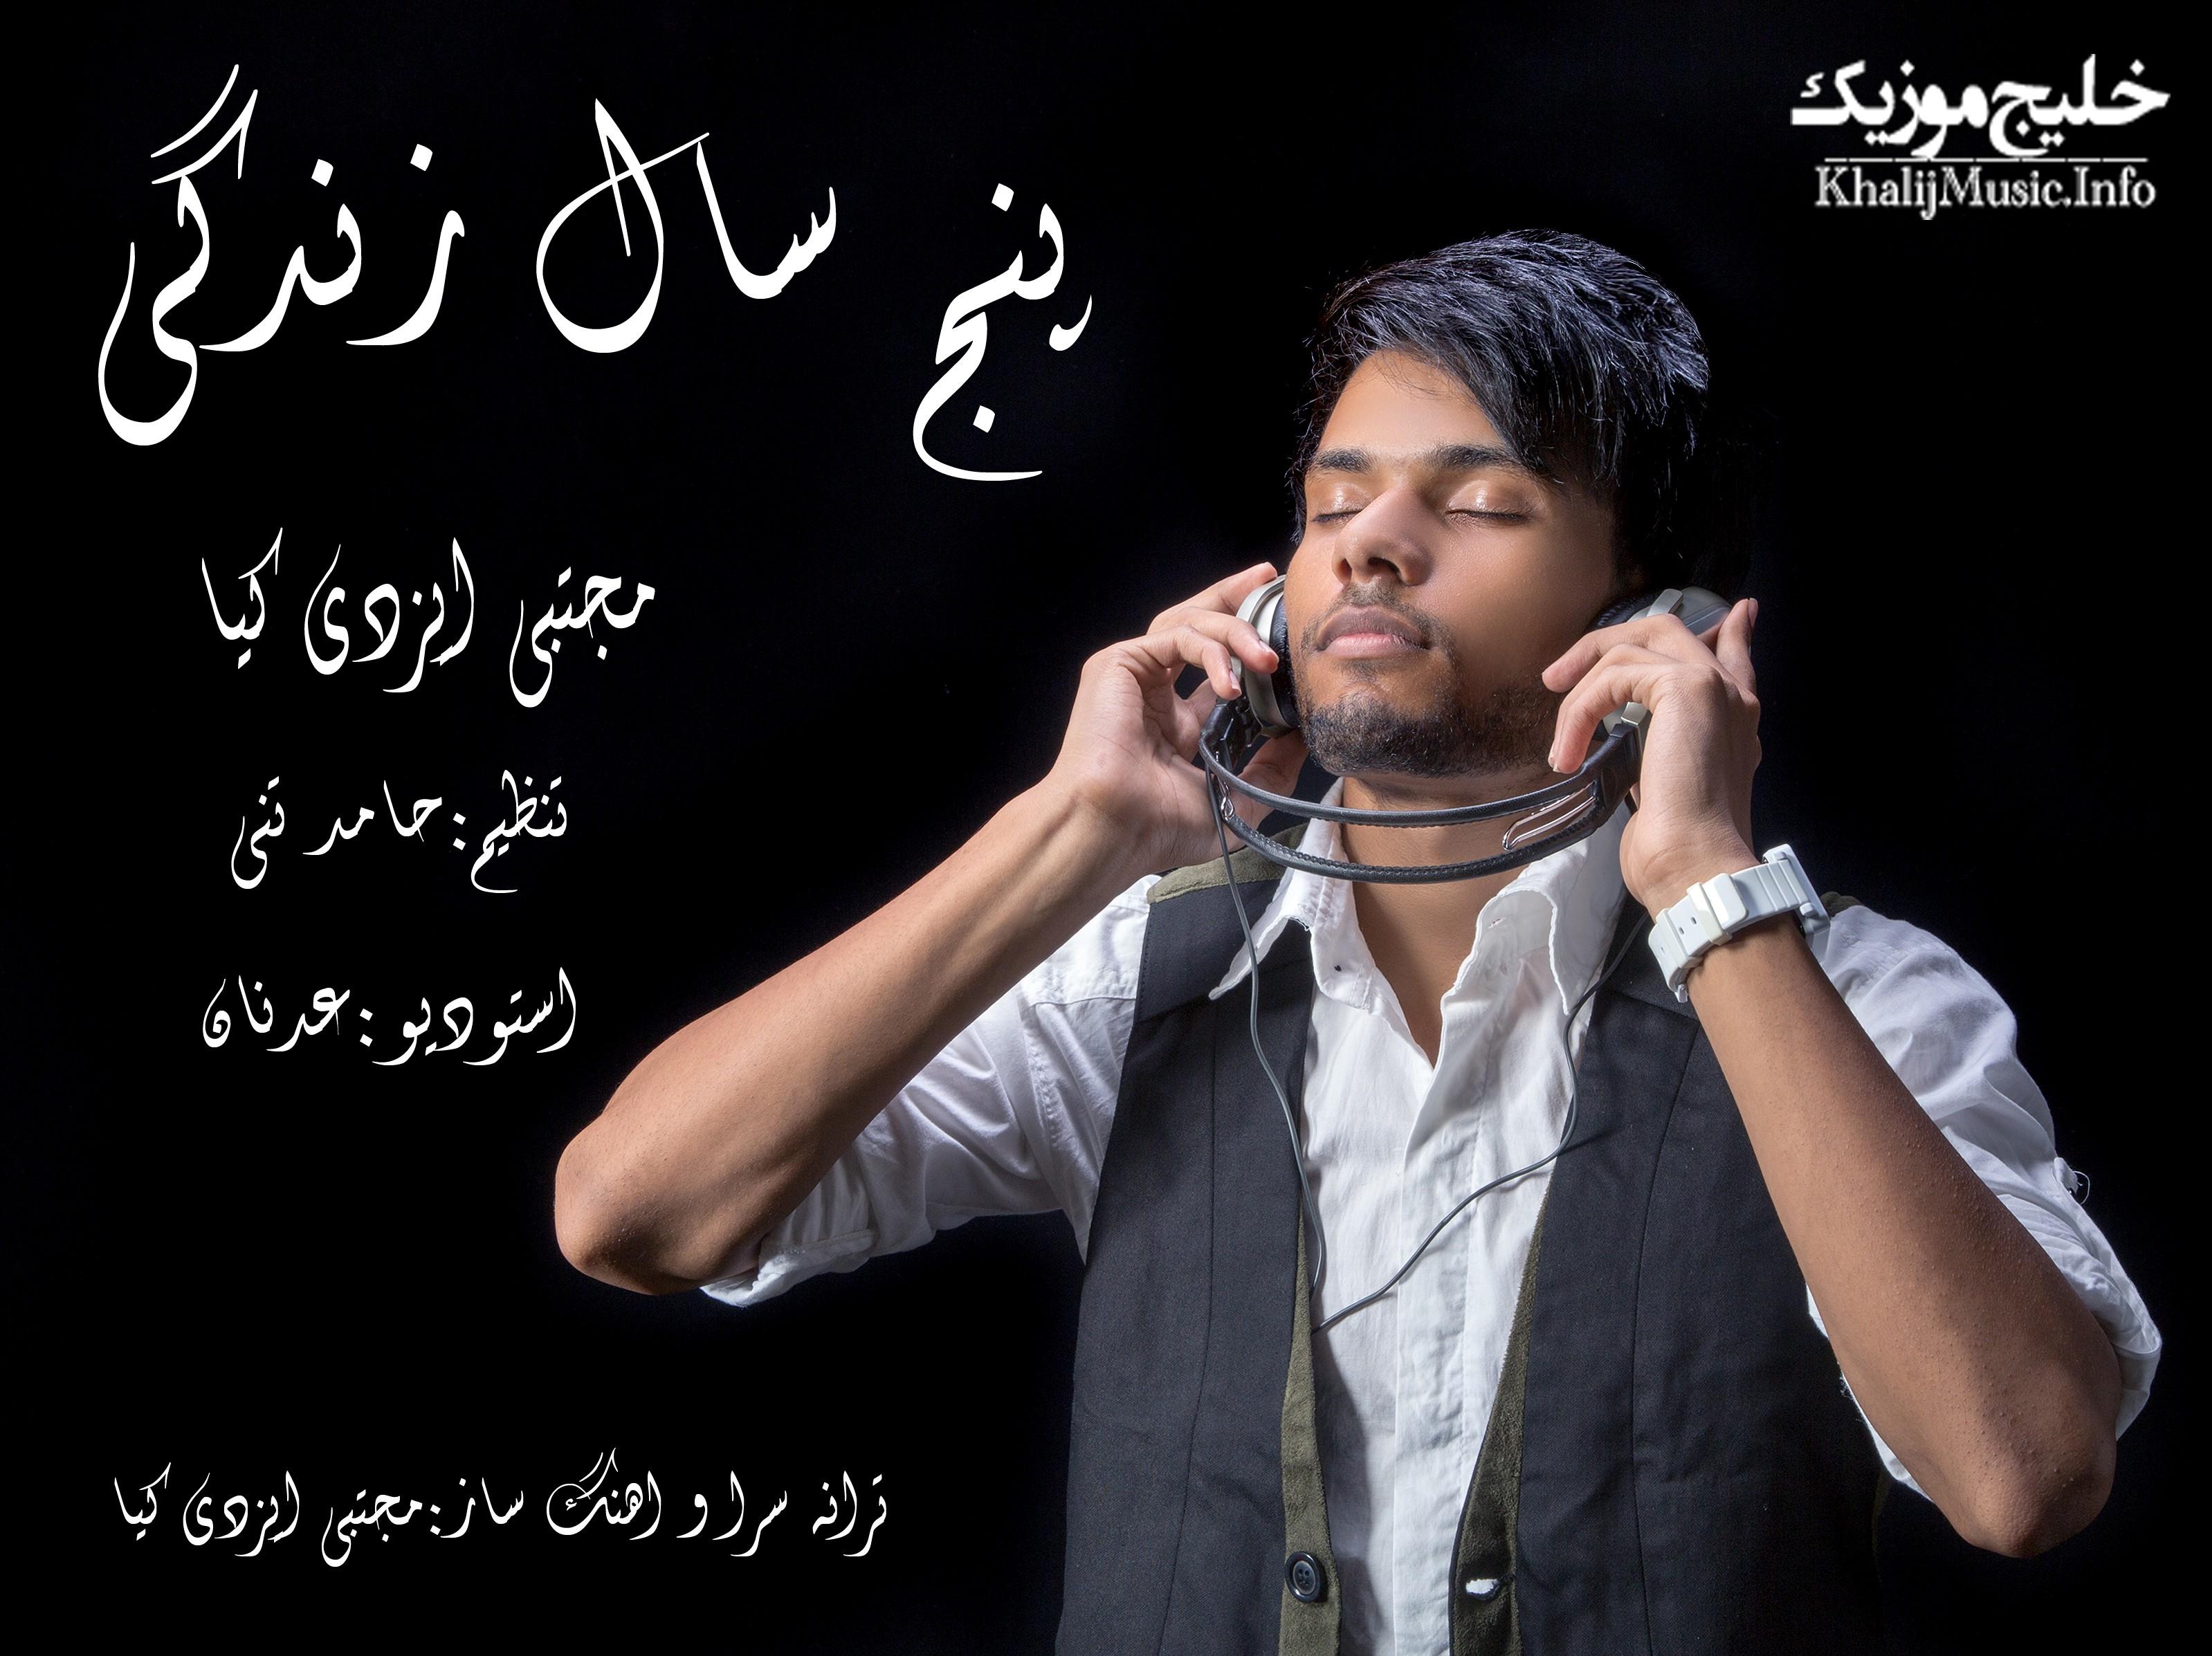 http://dl.khalijmusic.us/ax/Mojtaba.jpg